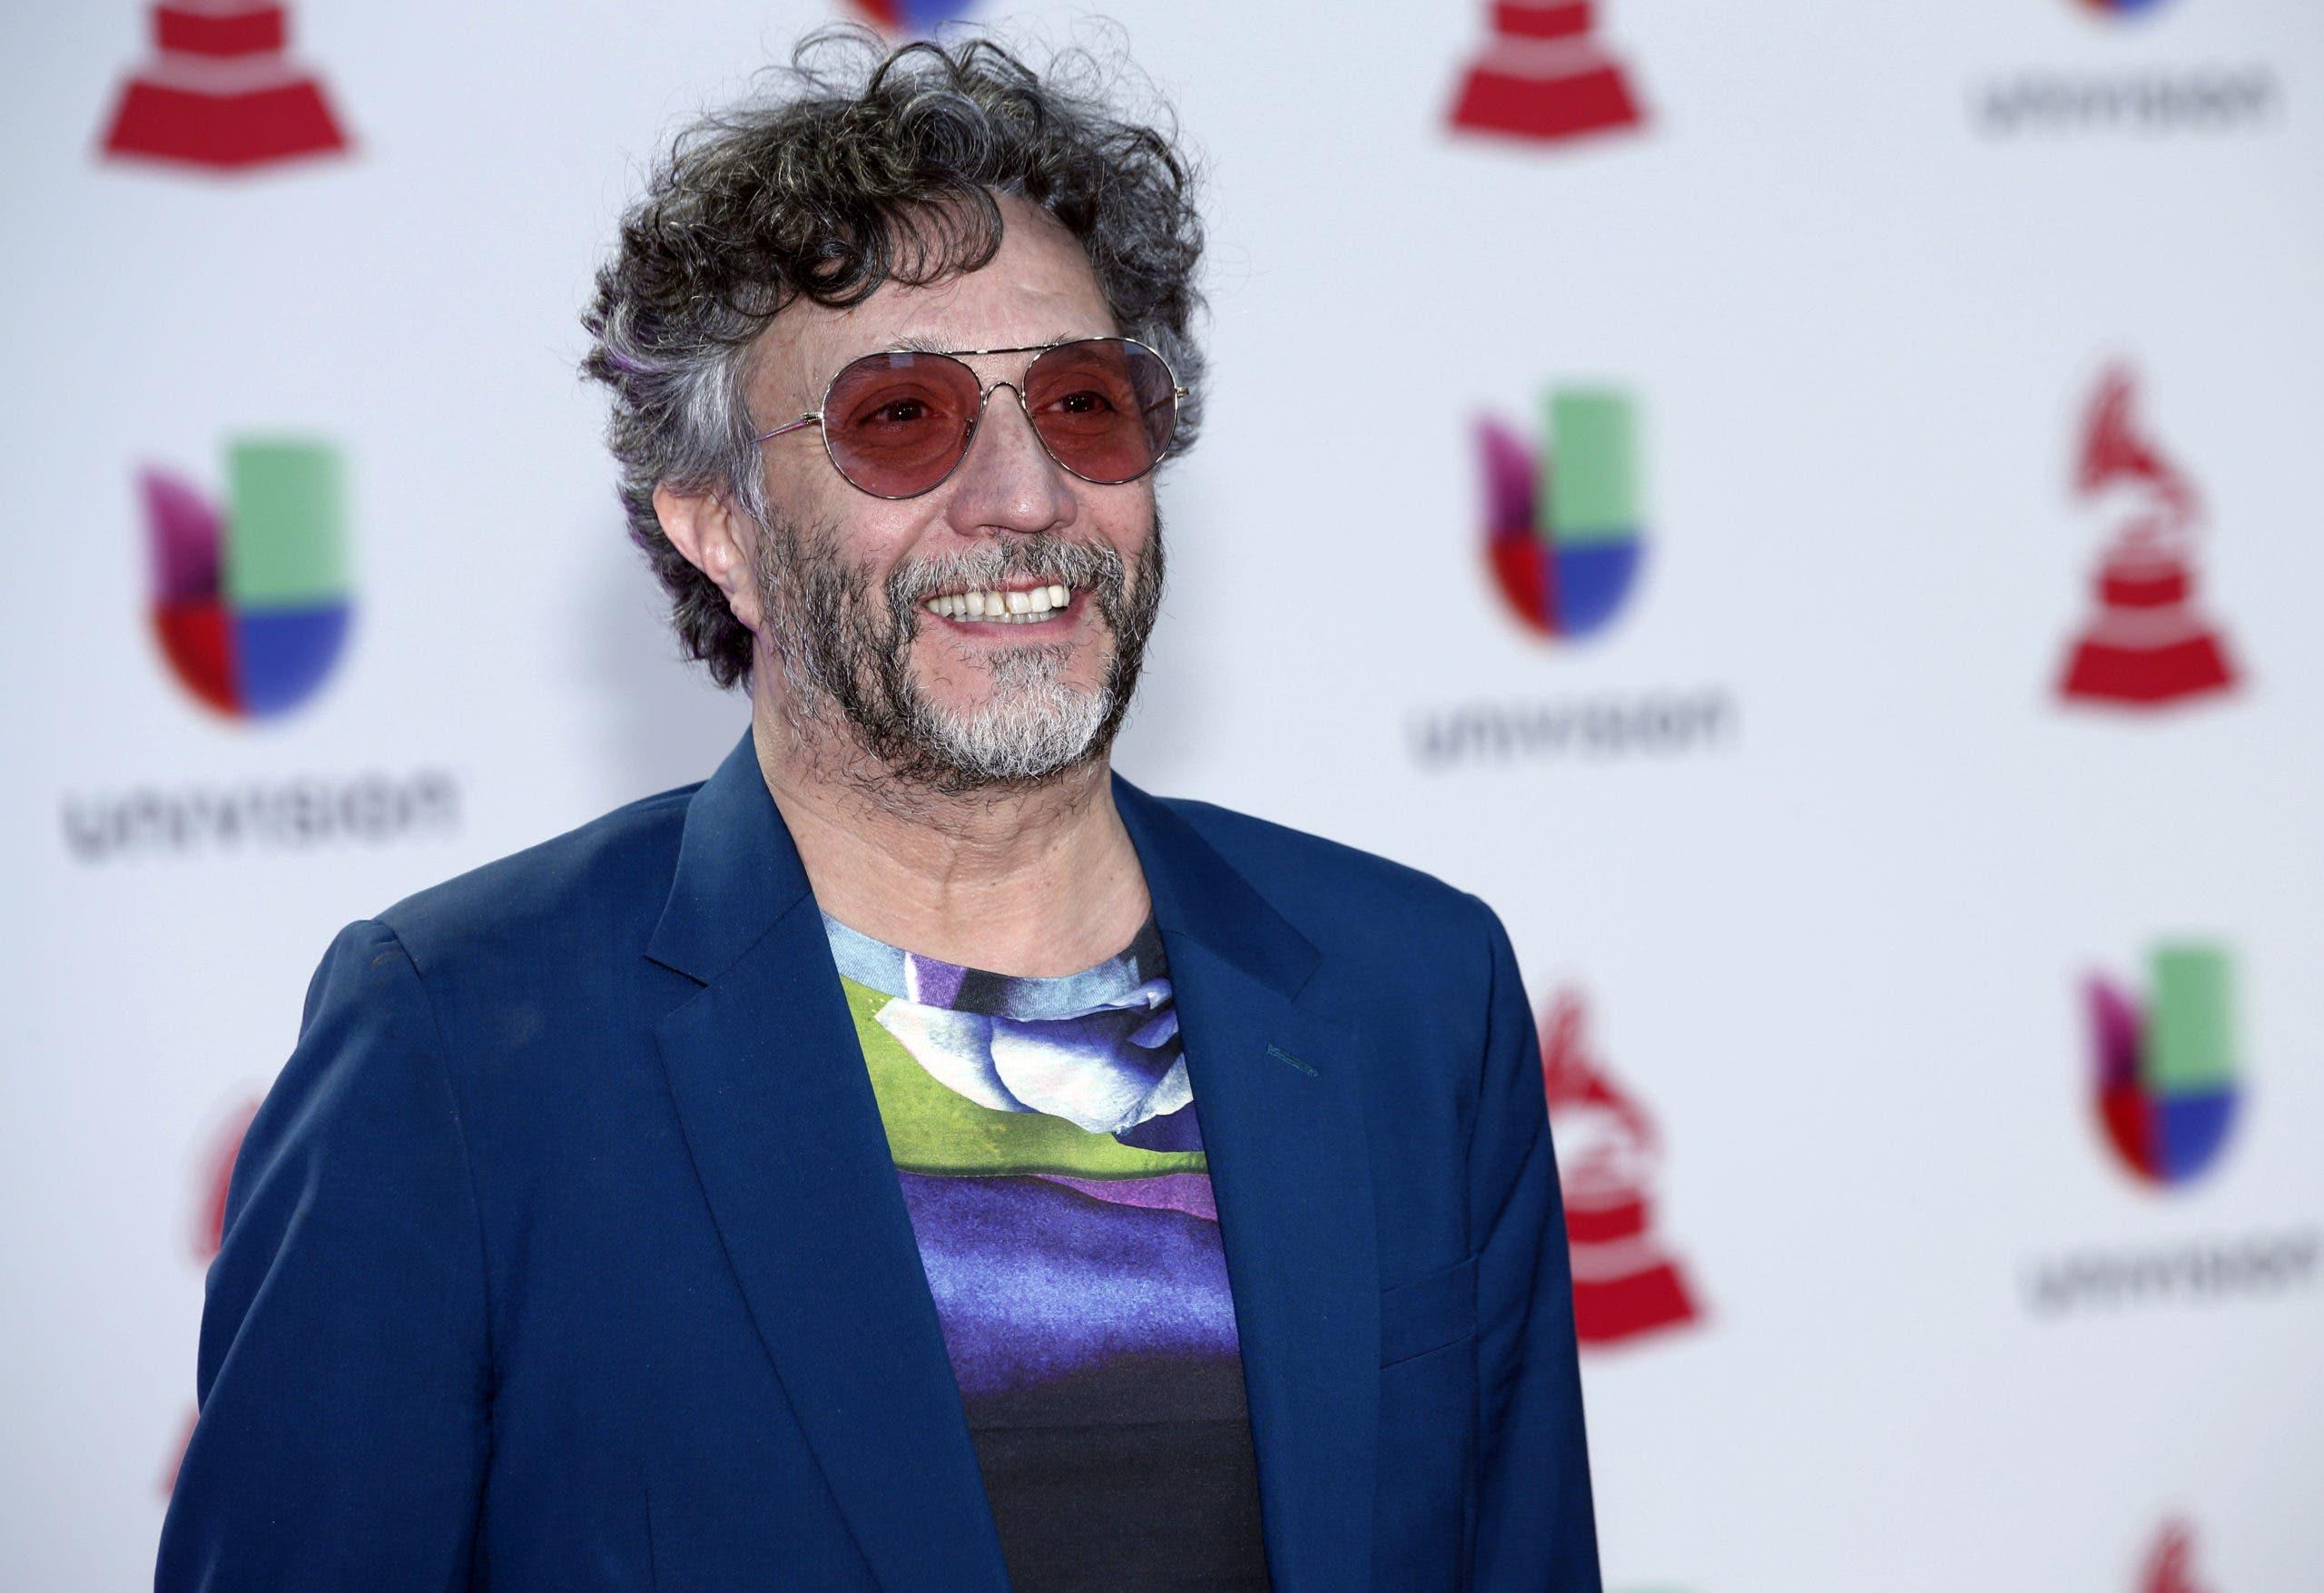 Fito Páez: O me ponía a escribir o terminaba en la cárcel